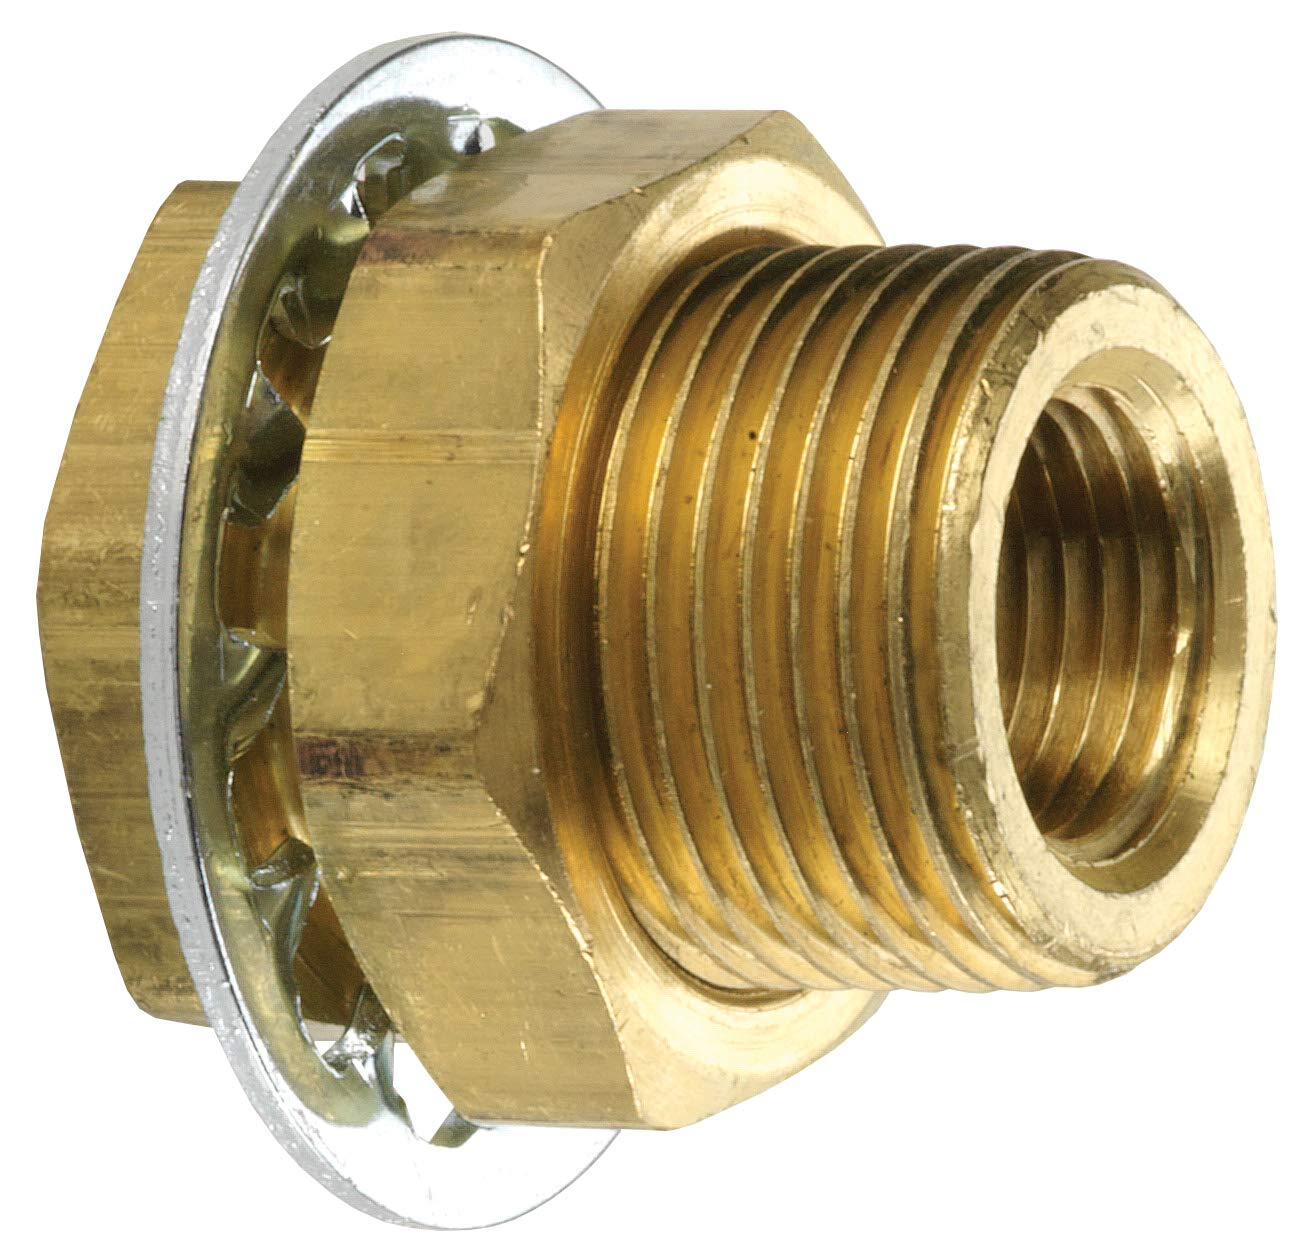 Brass Dixon 1//4 FNPTF Bulkhead Coupling 207BH4S 3//4 Hole Size Length .94